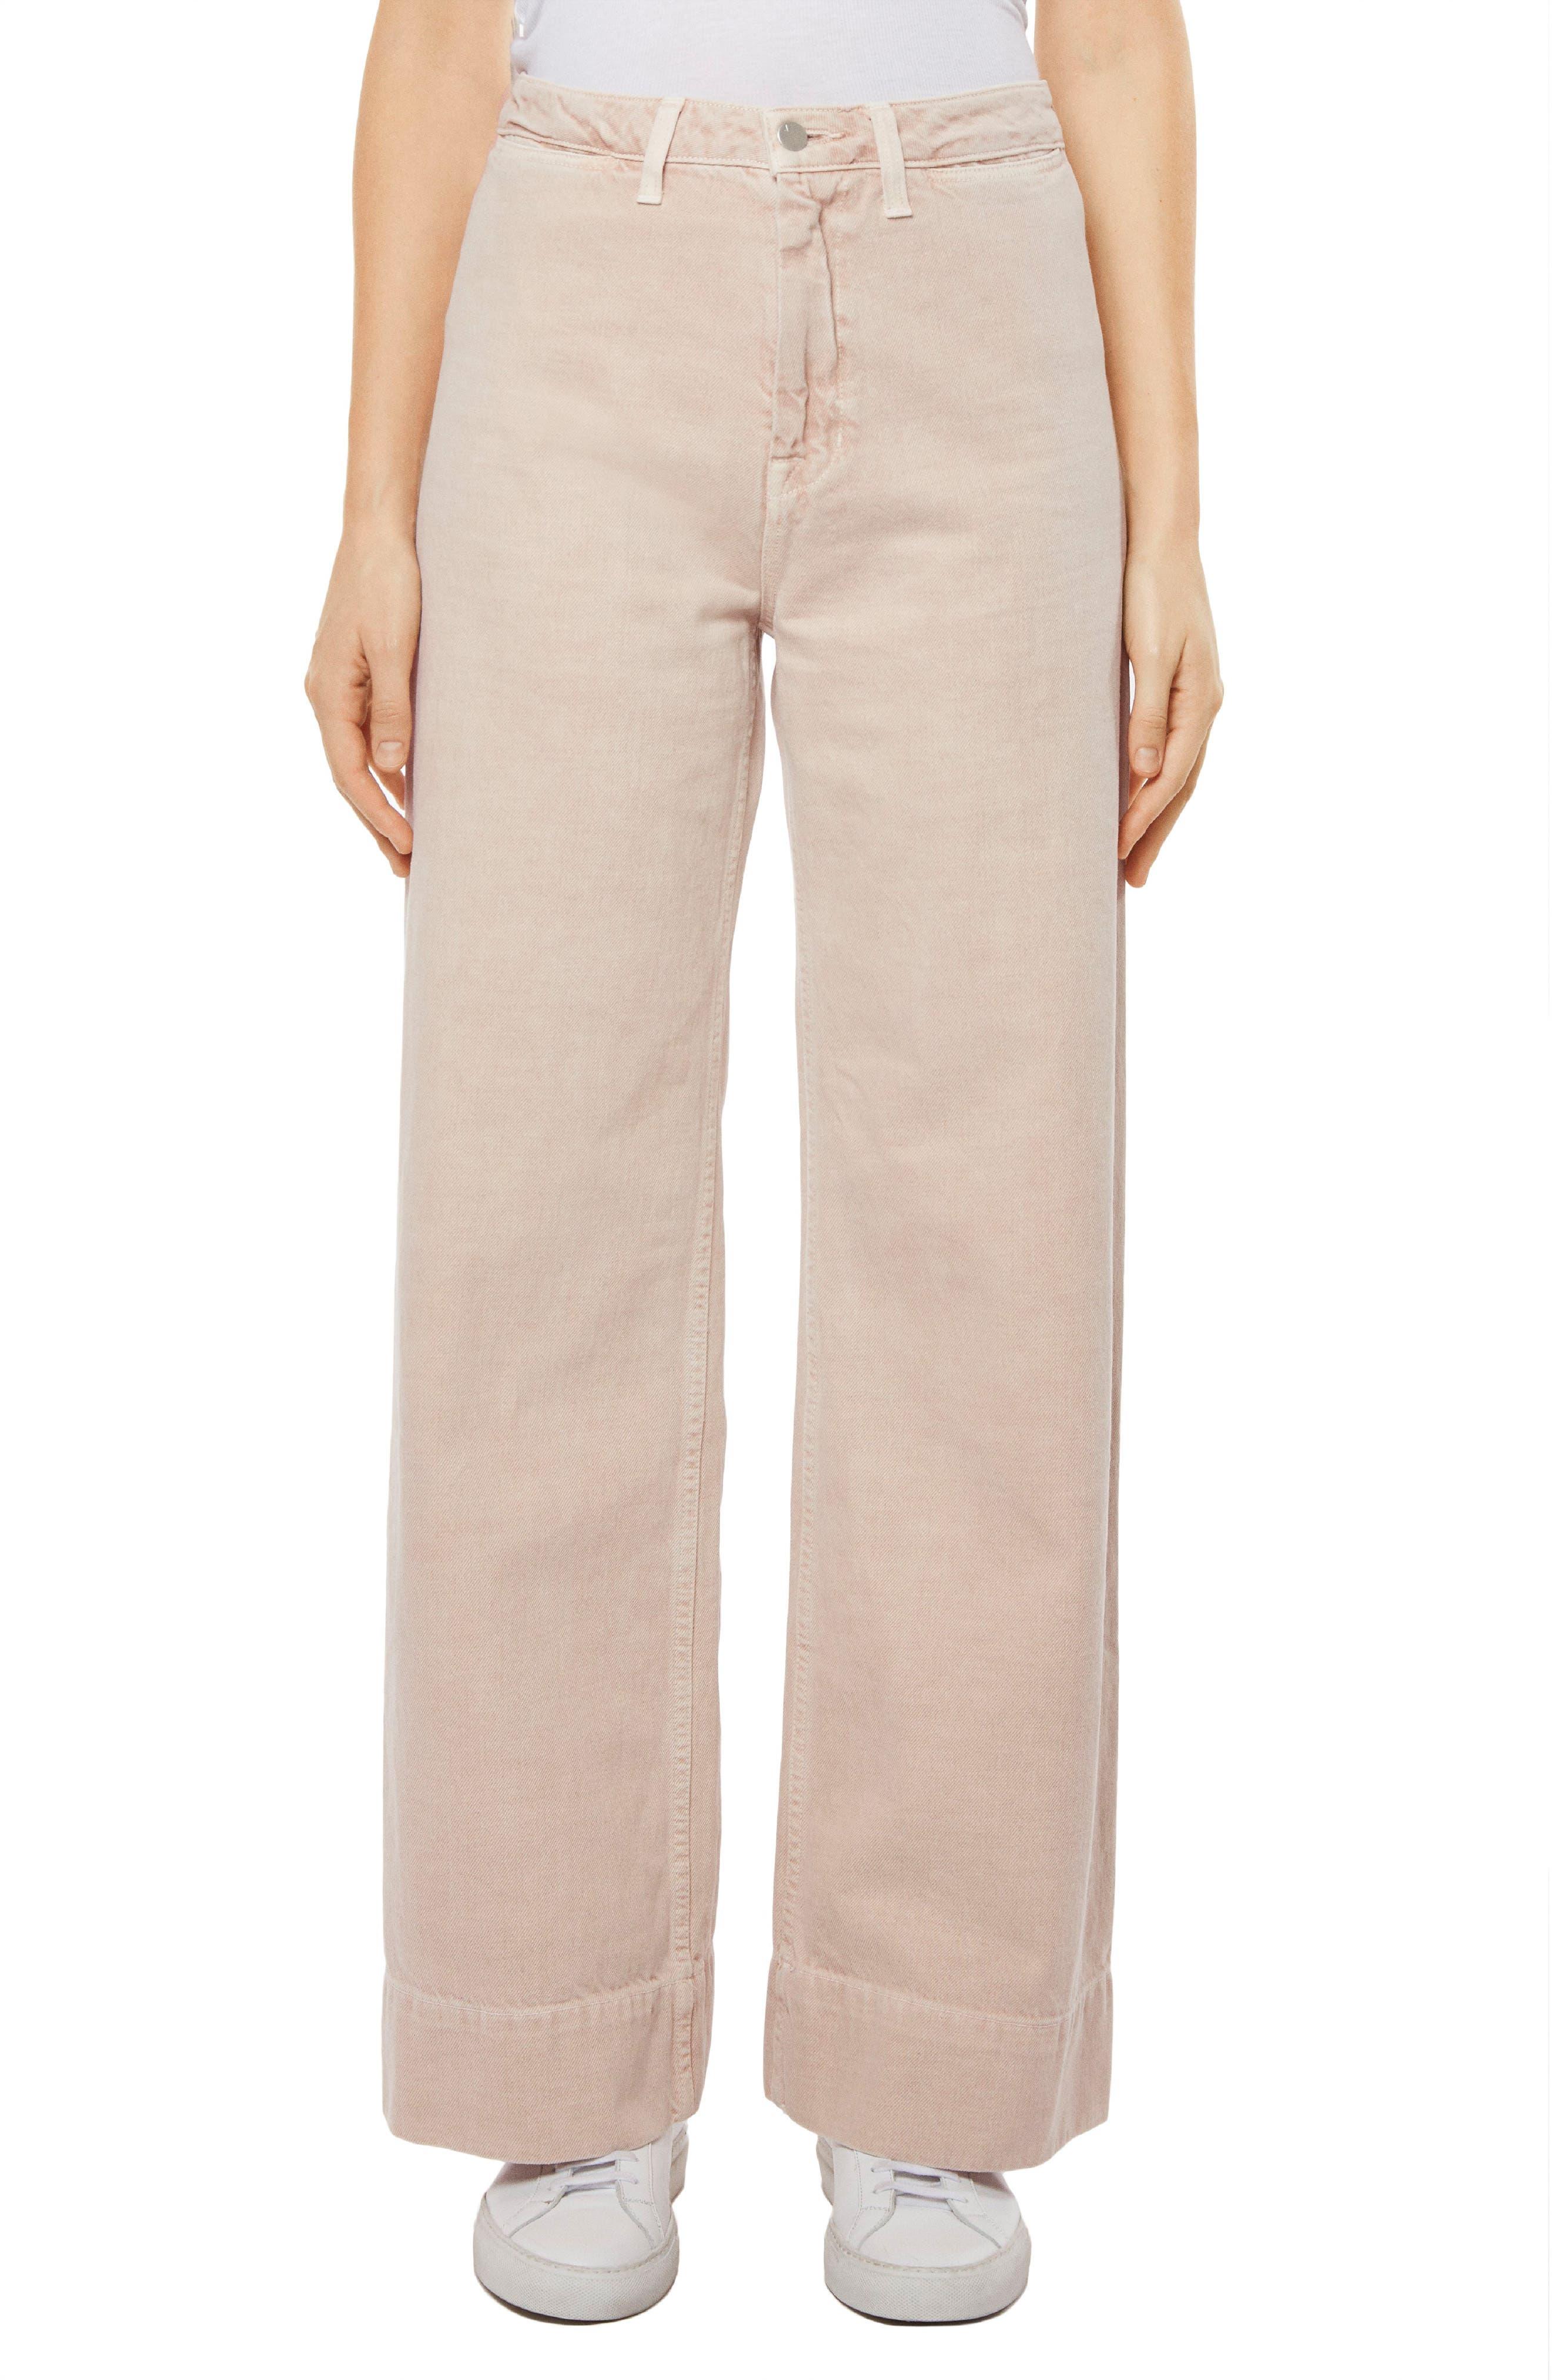 Hallton High Waist Wide Leg Jeans,                             Main thumbnail 1, color,